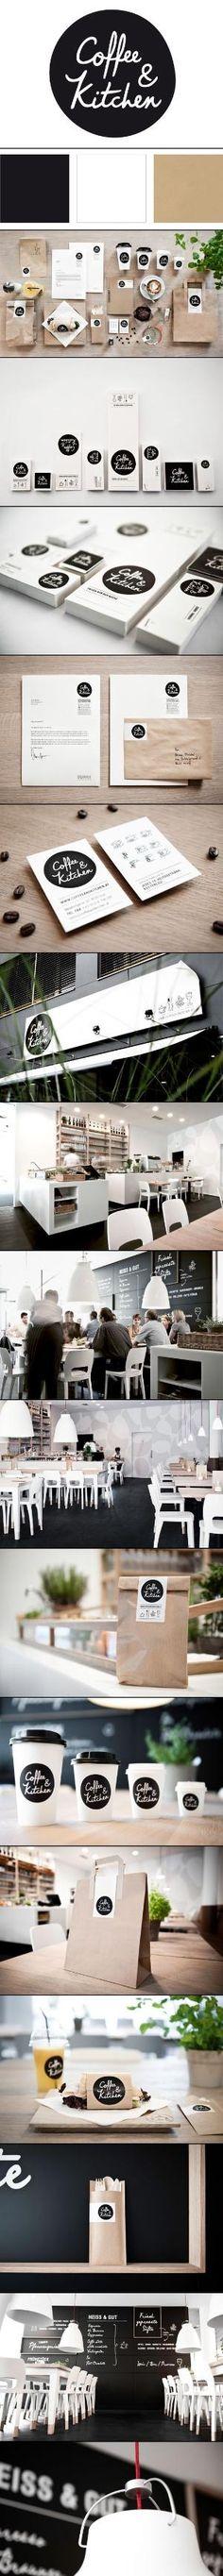 identity / Coffee & Kitchen | Moodley Brand Identity | #stationary #corporate #design #corporatedesign #identity #branding #marketing < repinned by www.BlickeDeeler.de | Take a look at www.LogoGestaltung-Hamburg.de by Krista.S